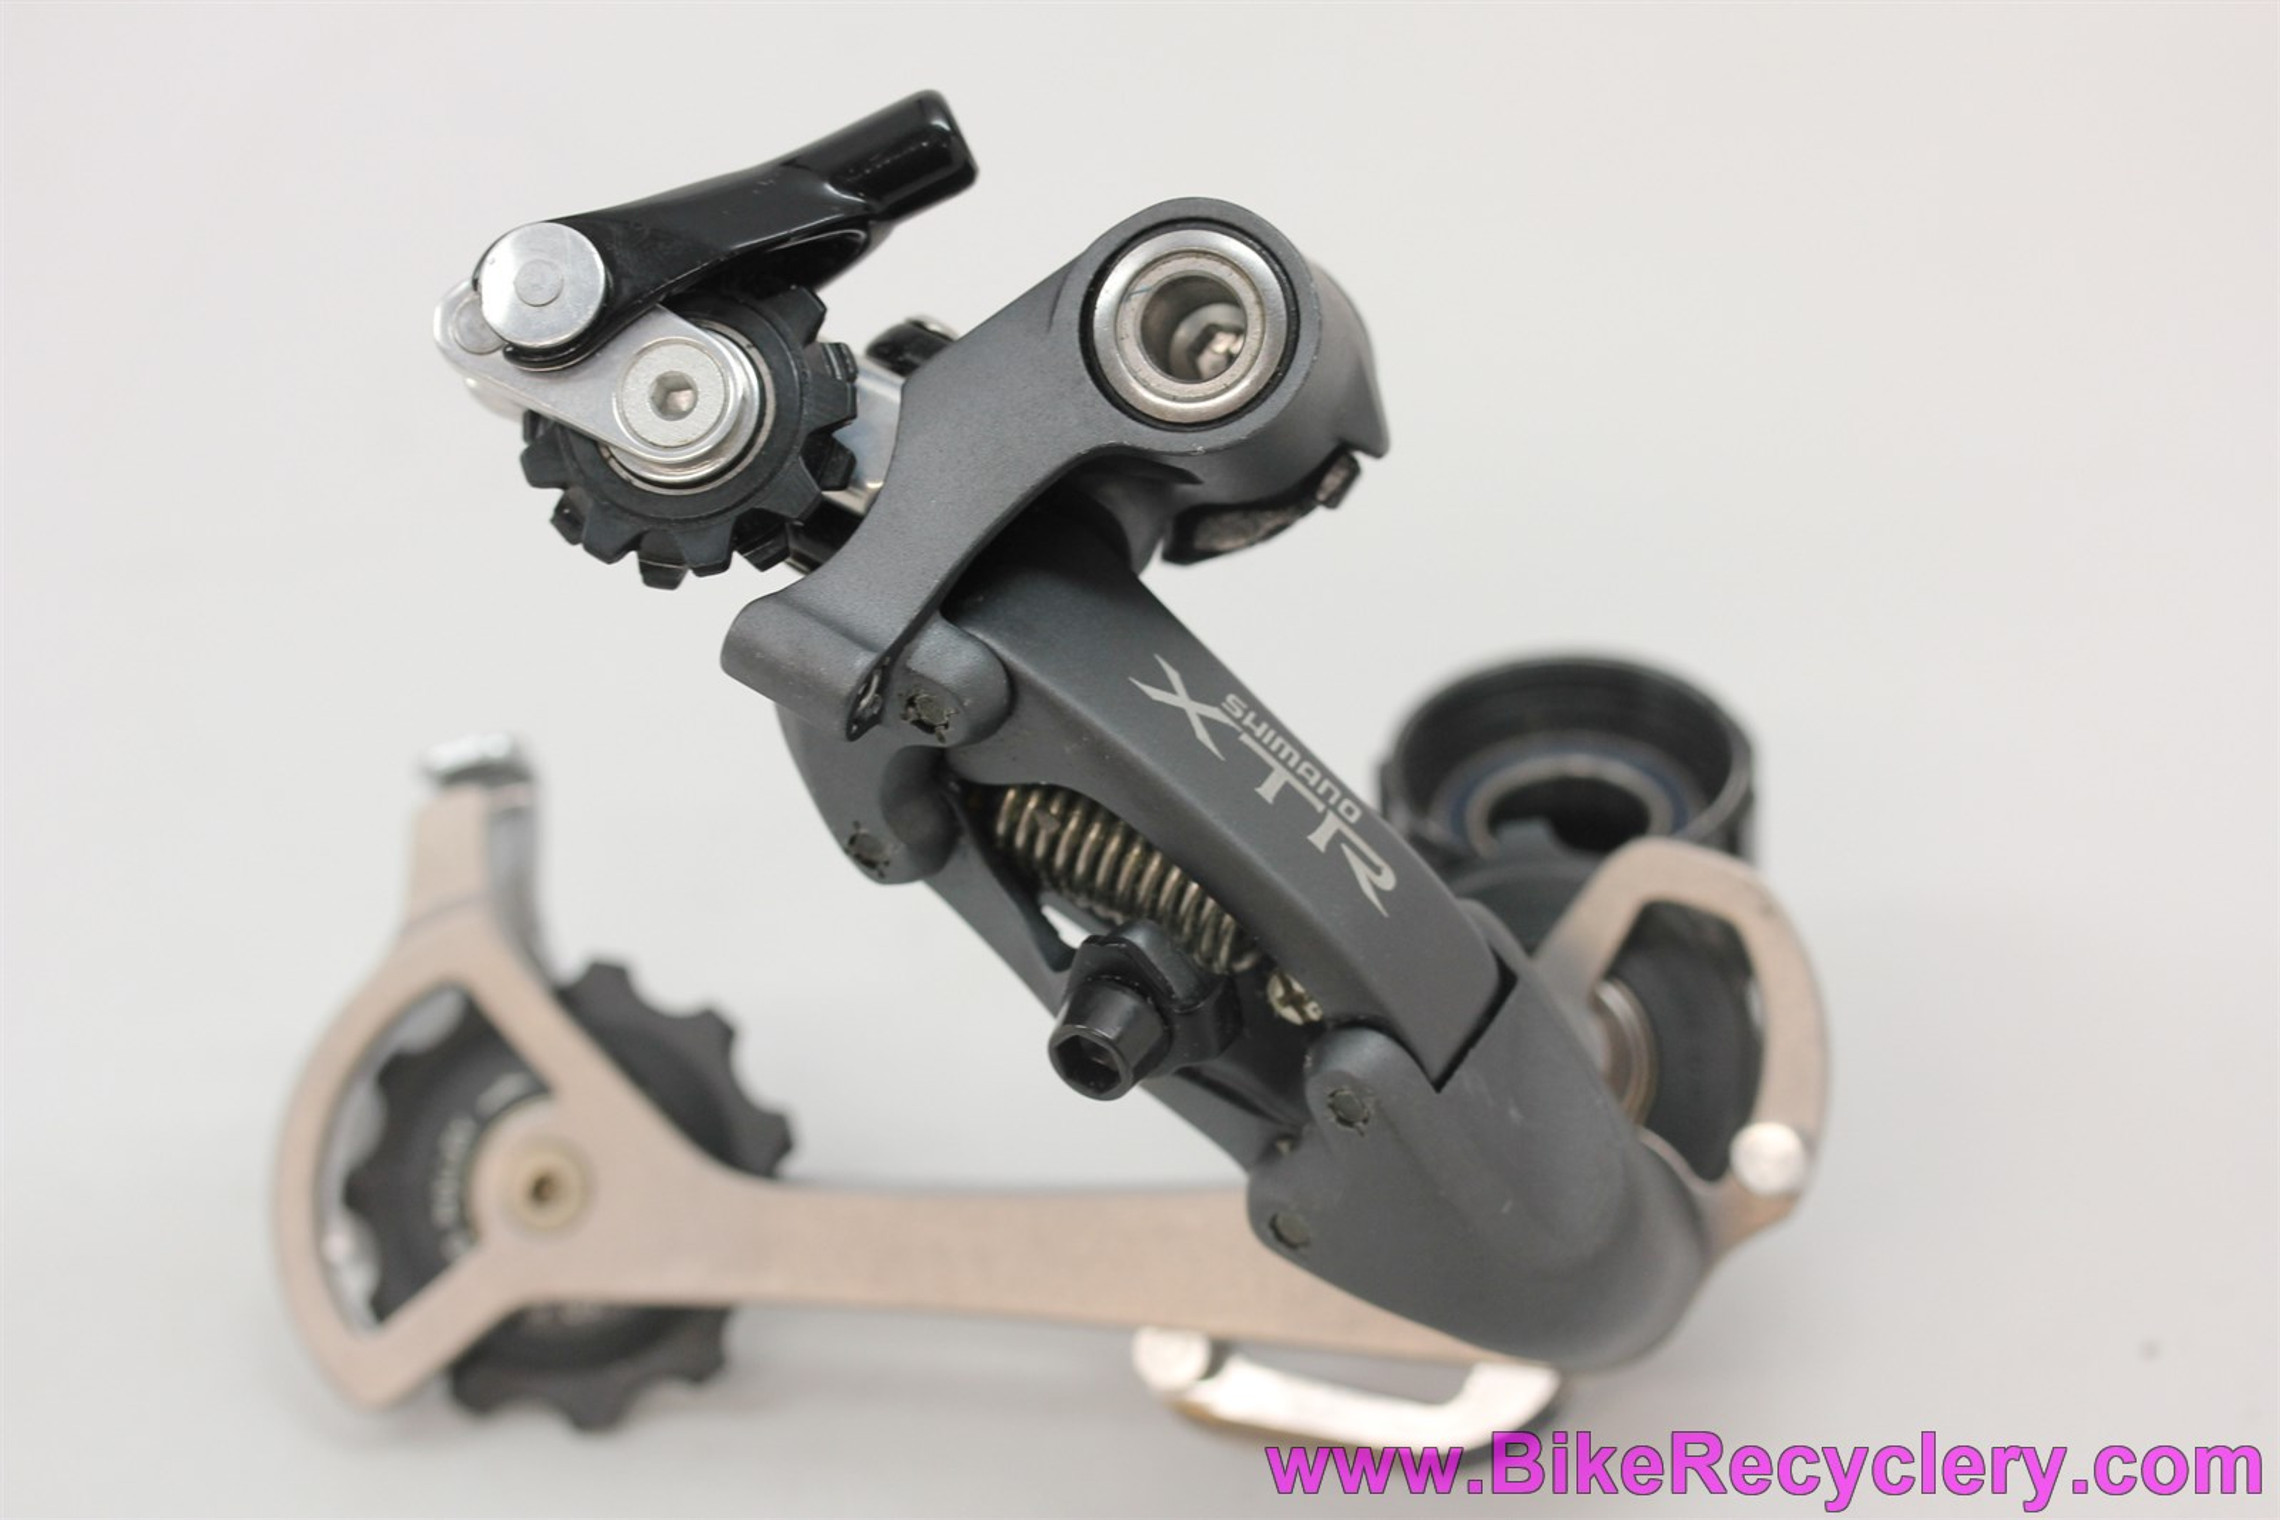 Shimano XTR M951 Rapid Rise Rear Derailleur 8-speed 9-speed RD-M951-GS Midcage